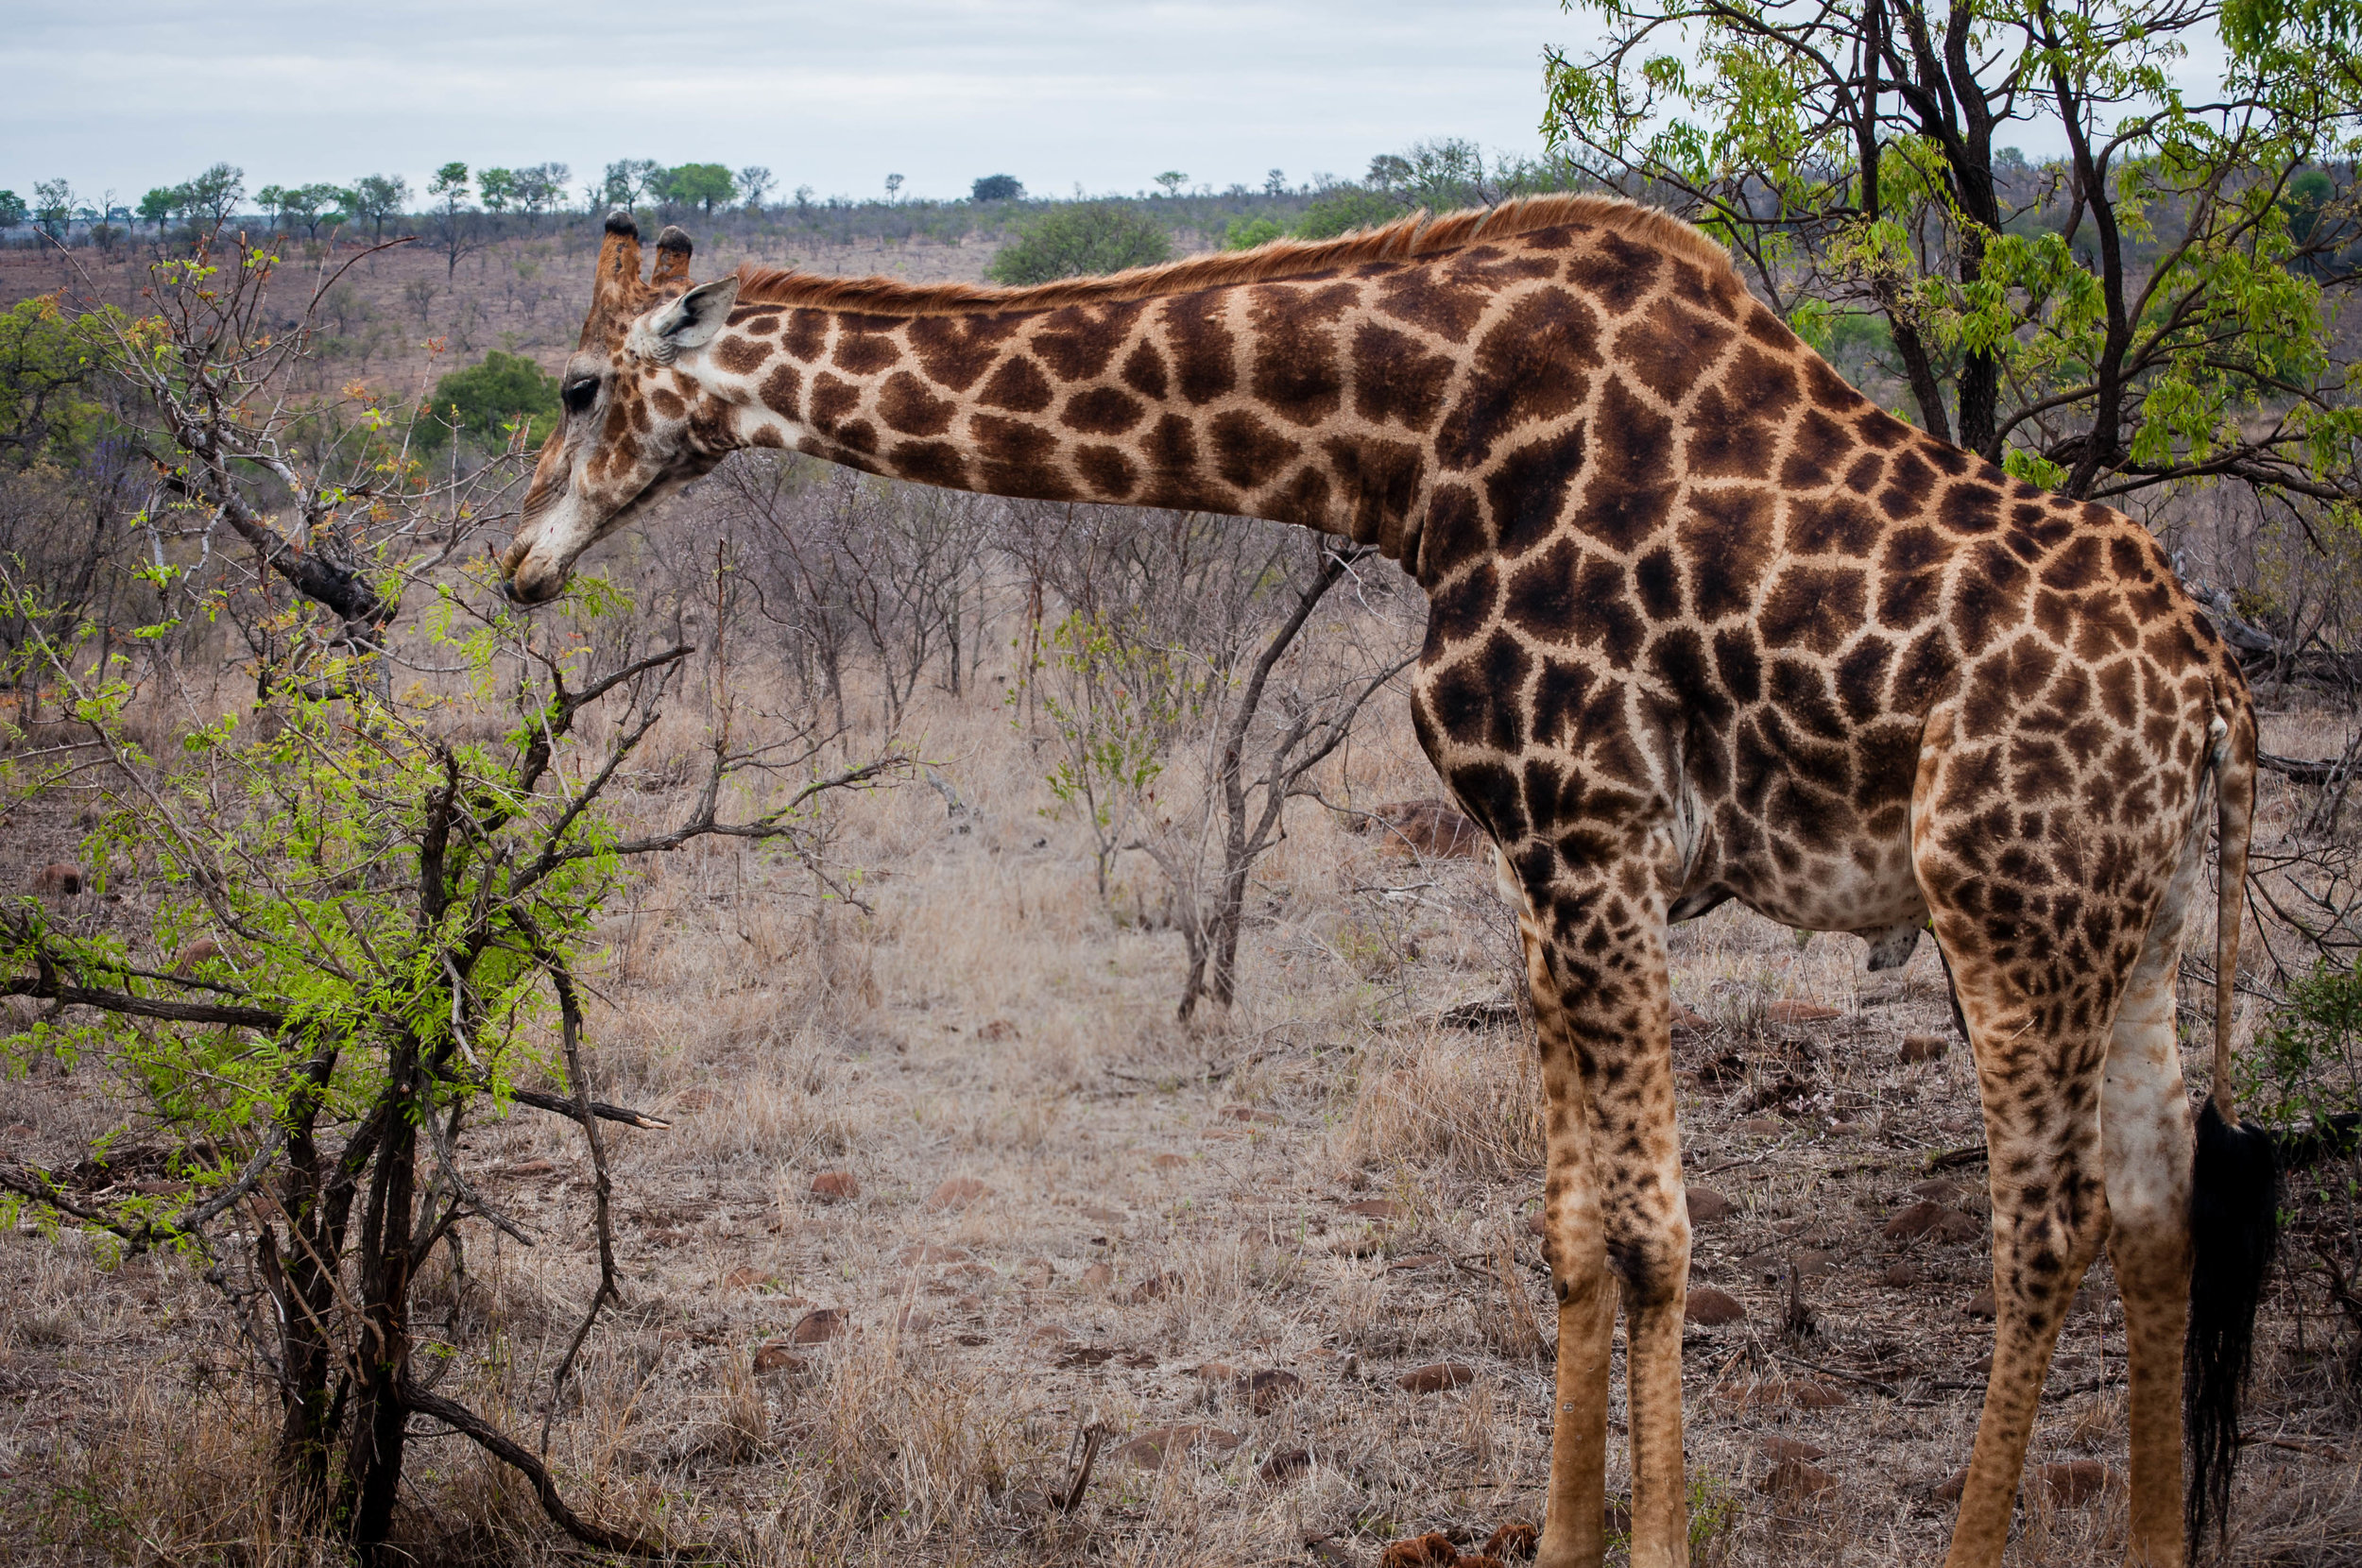 Giraffes at Kruger park. safari planner